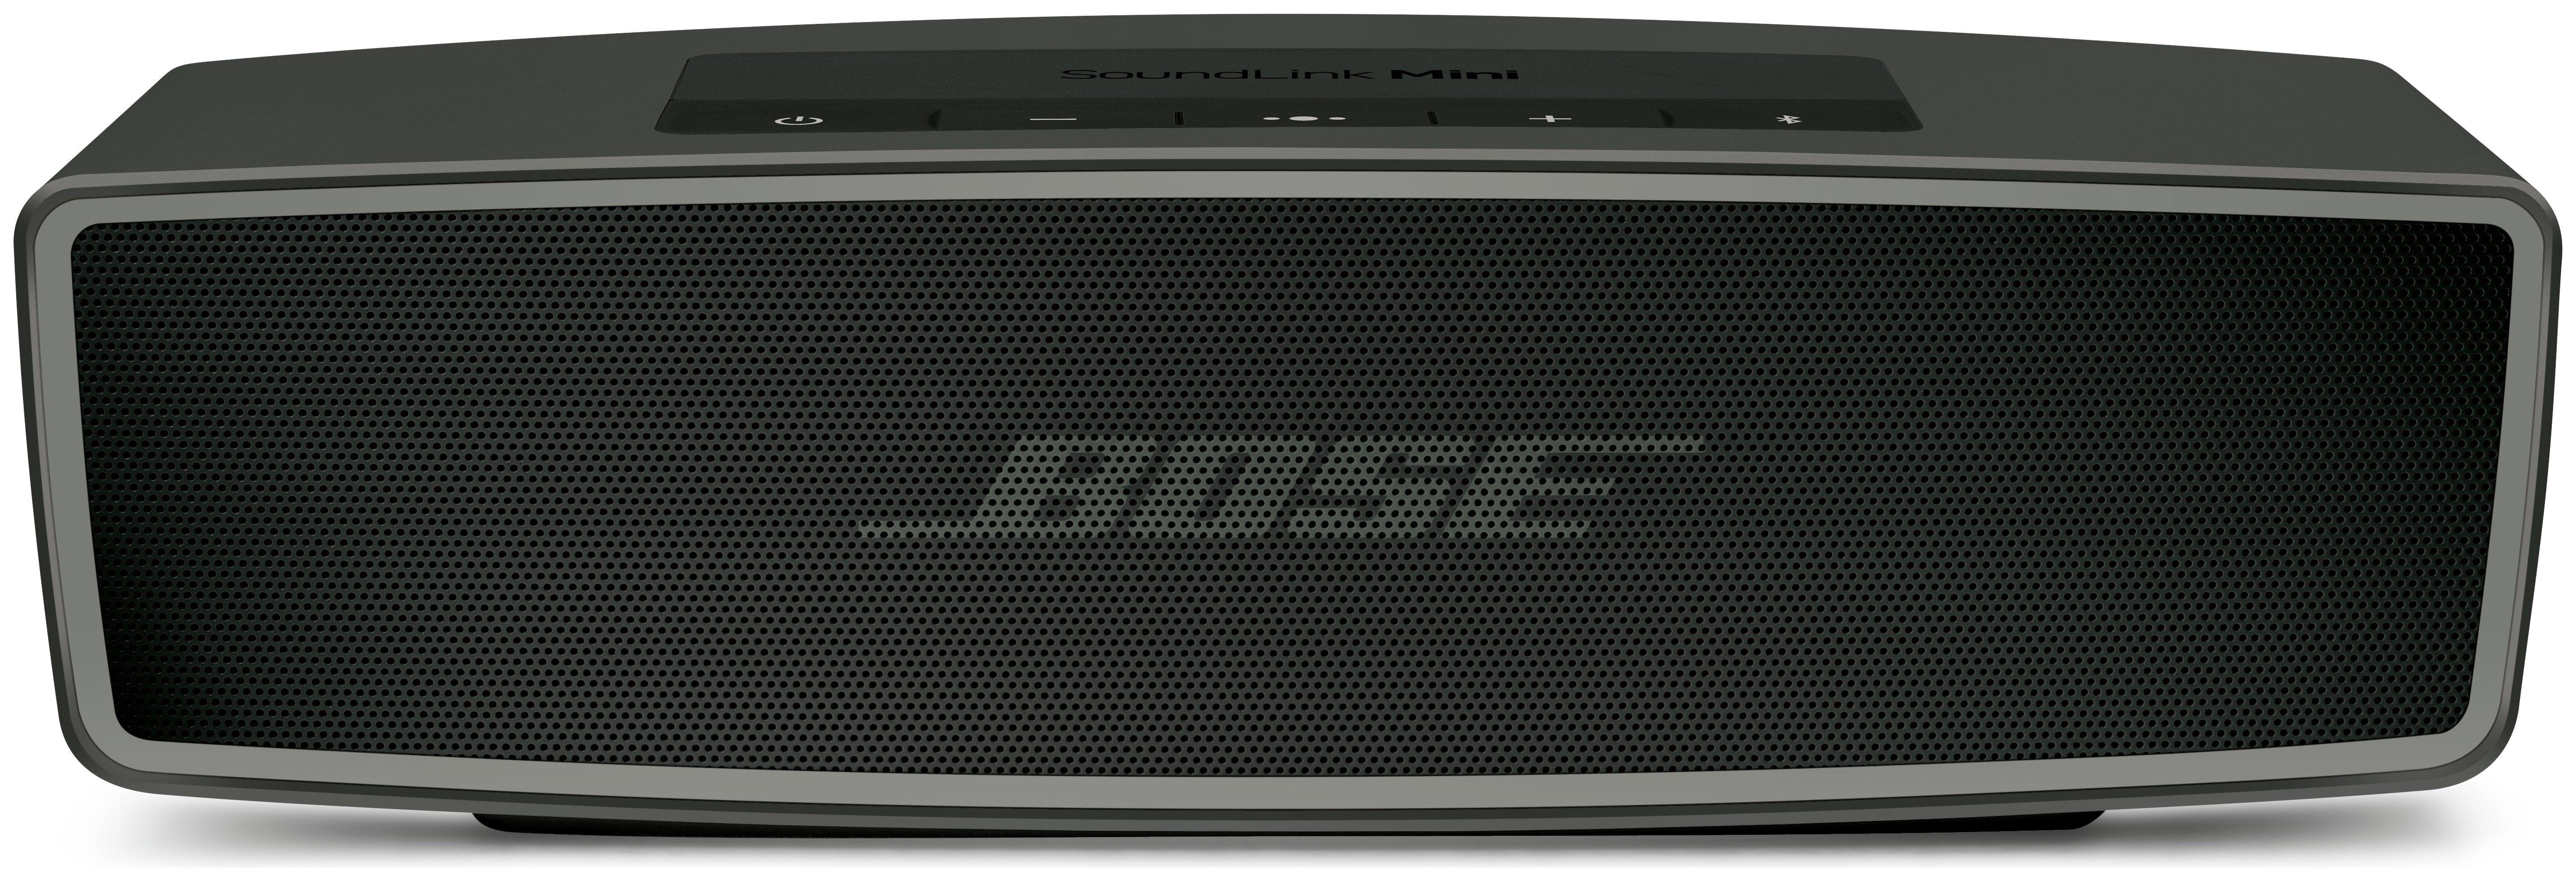 Bose Soundlink Mini Series II - Carbon